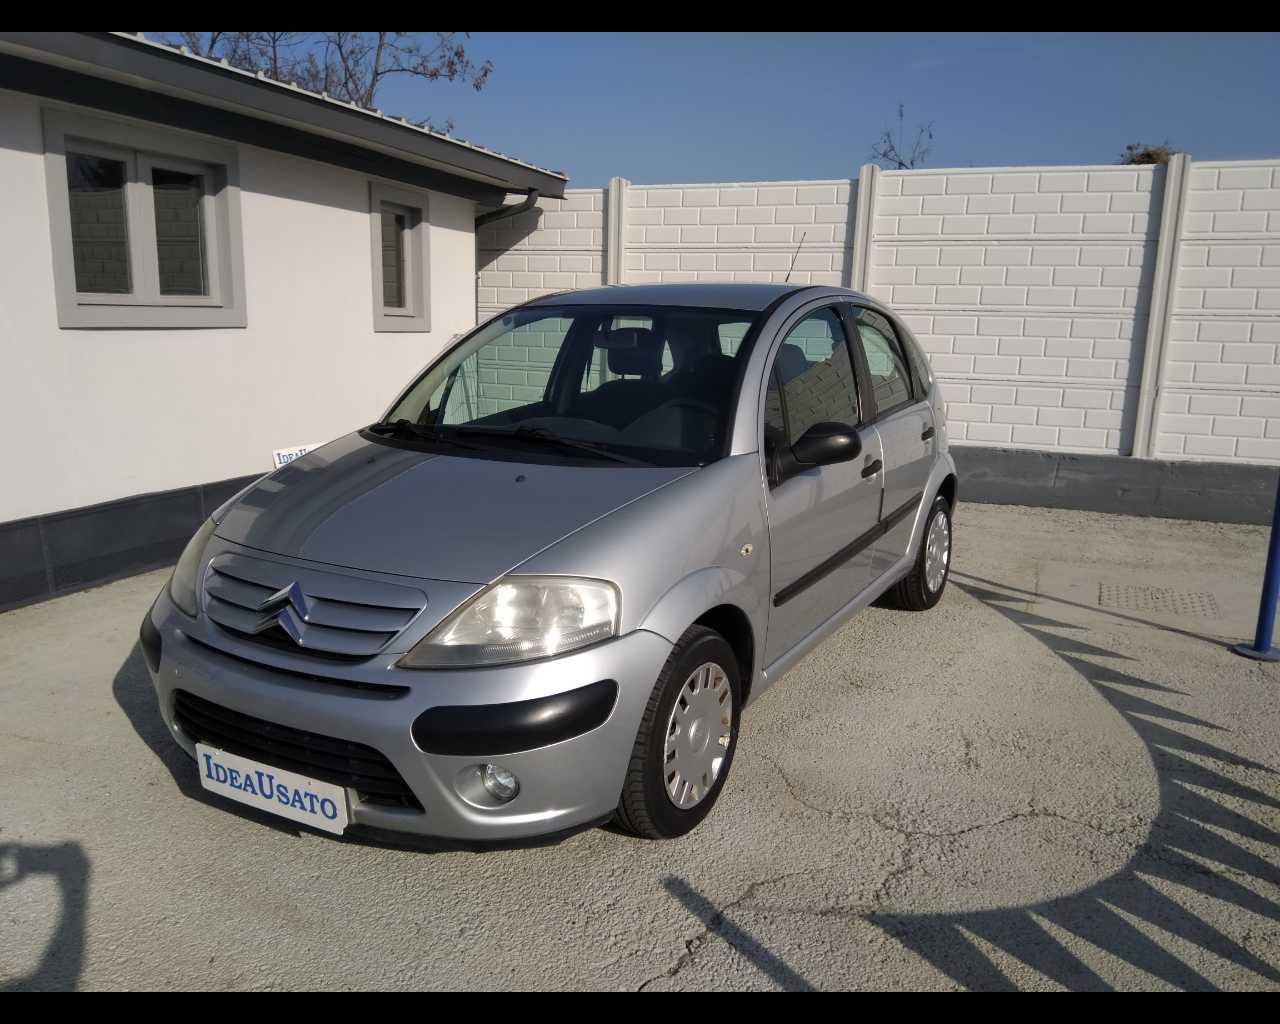 CITROEN  C3 1.1 Exclusive Style (exclusive), Benzina Verde, €3.900 - C3 I 2002 - C3 1.1 Exclusive Style (exclusive)